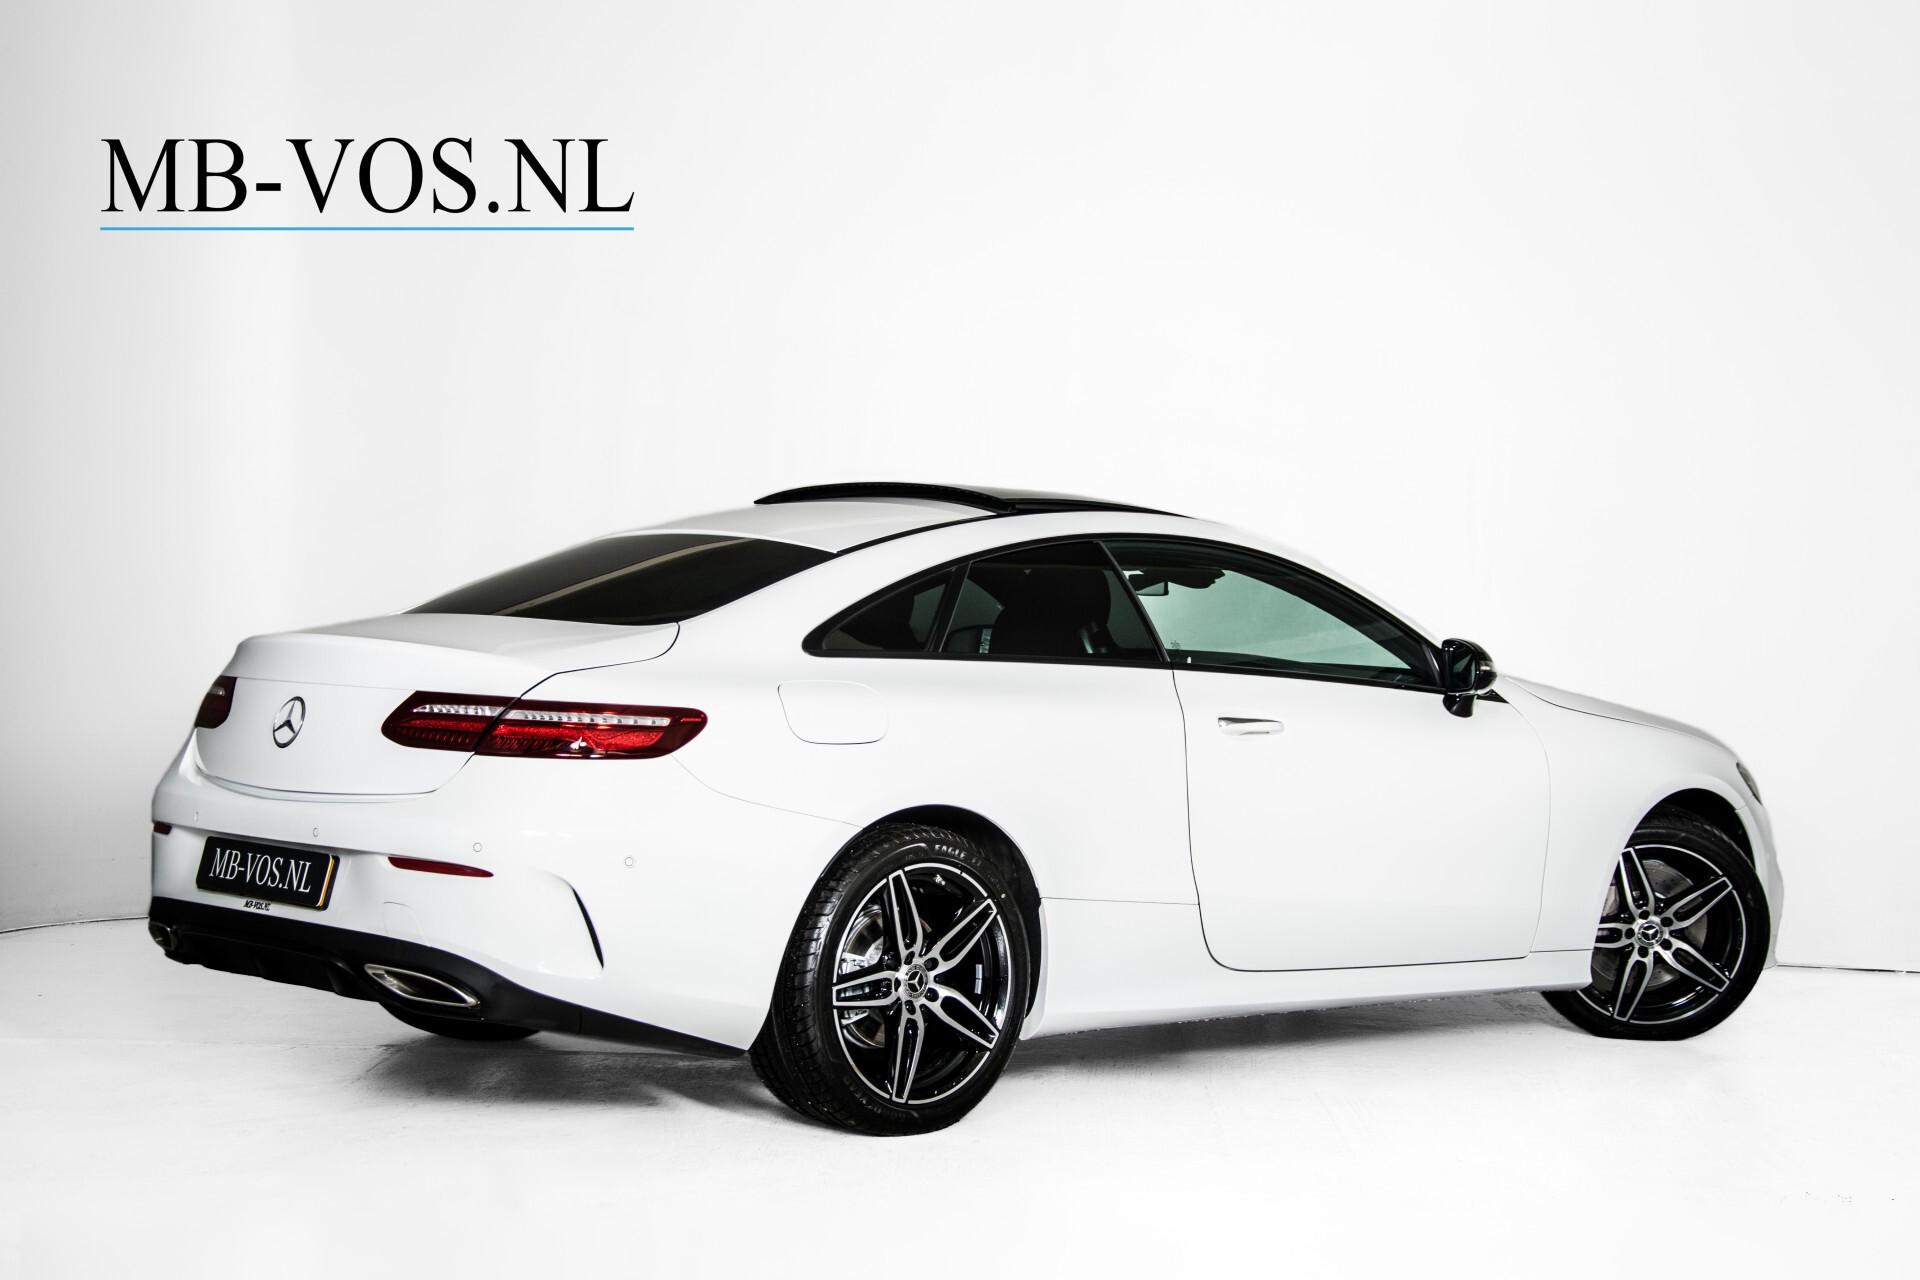 Mercedes-Benz E-Klasse Coupé 300 AMG Panorama/Rij-assist/Keyless/Massage/Memory/HUD/Standkachel/Night Aut9 Foto 2